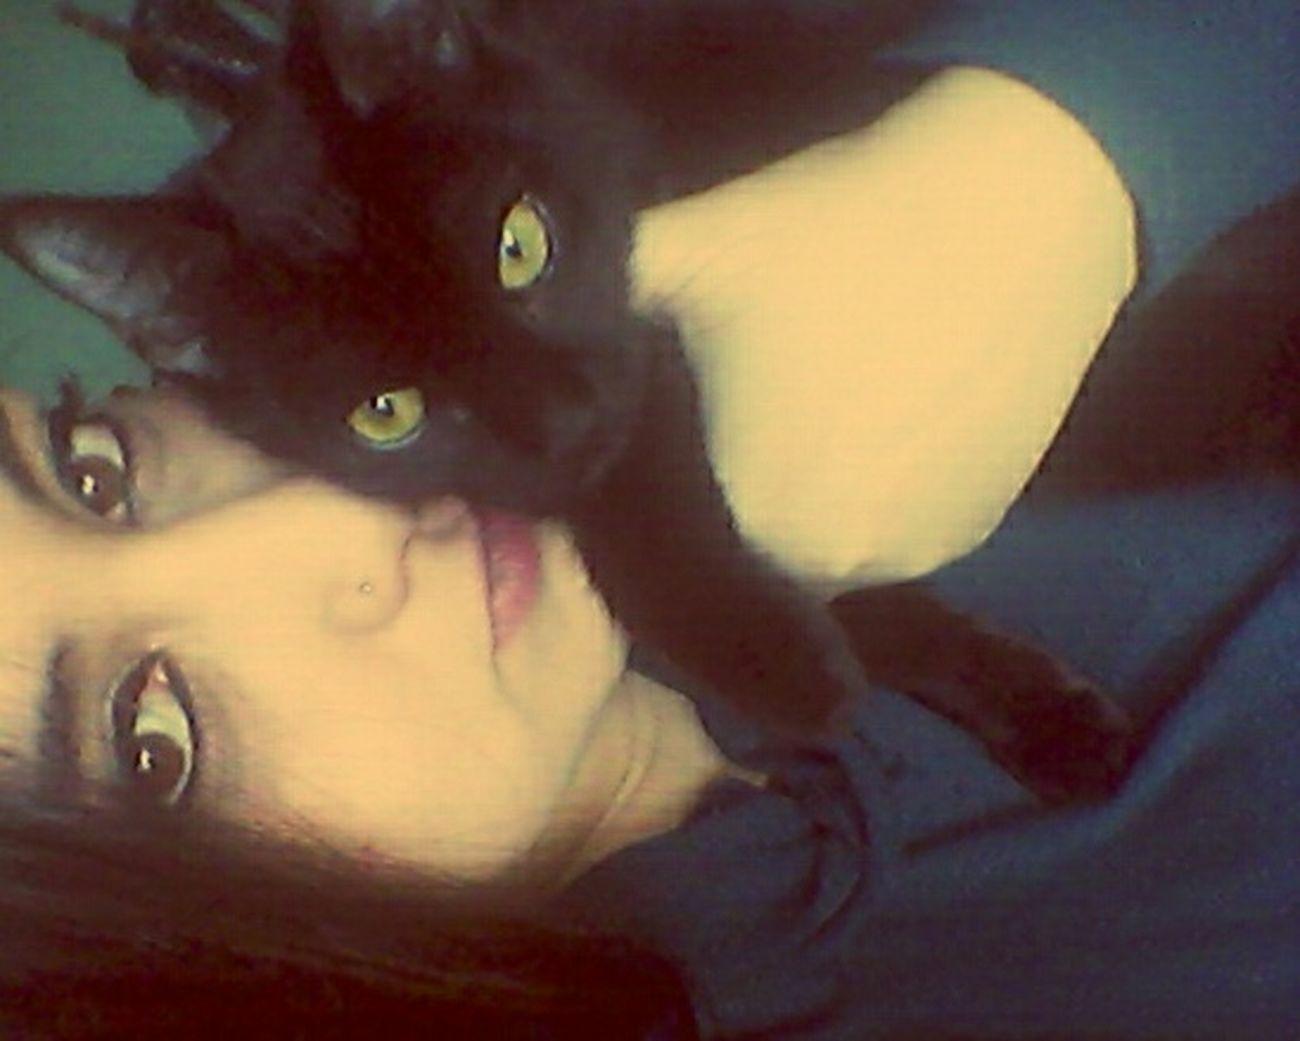 Te extraño u.u Cat♡ Cat Lovers Gatito BLackCat Eyes Green Eyes Gatito Negro Gatto Gattonero Ilovemycat Teextraño